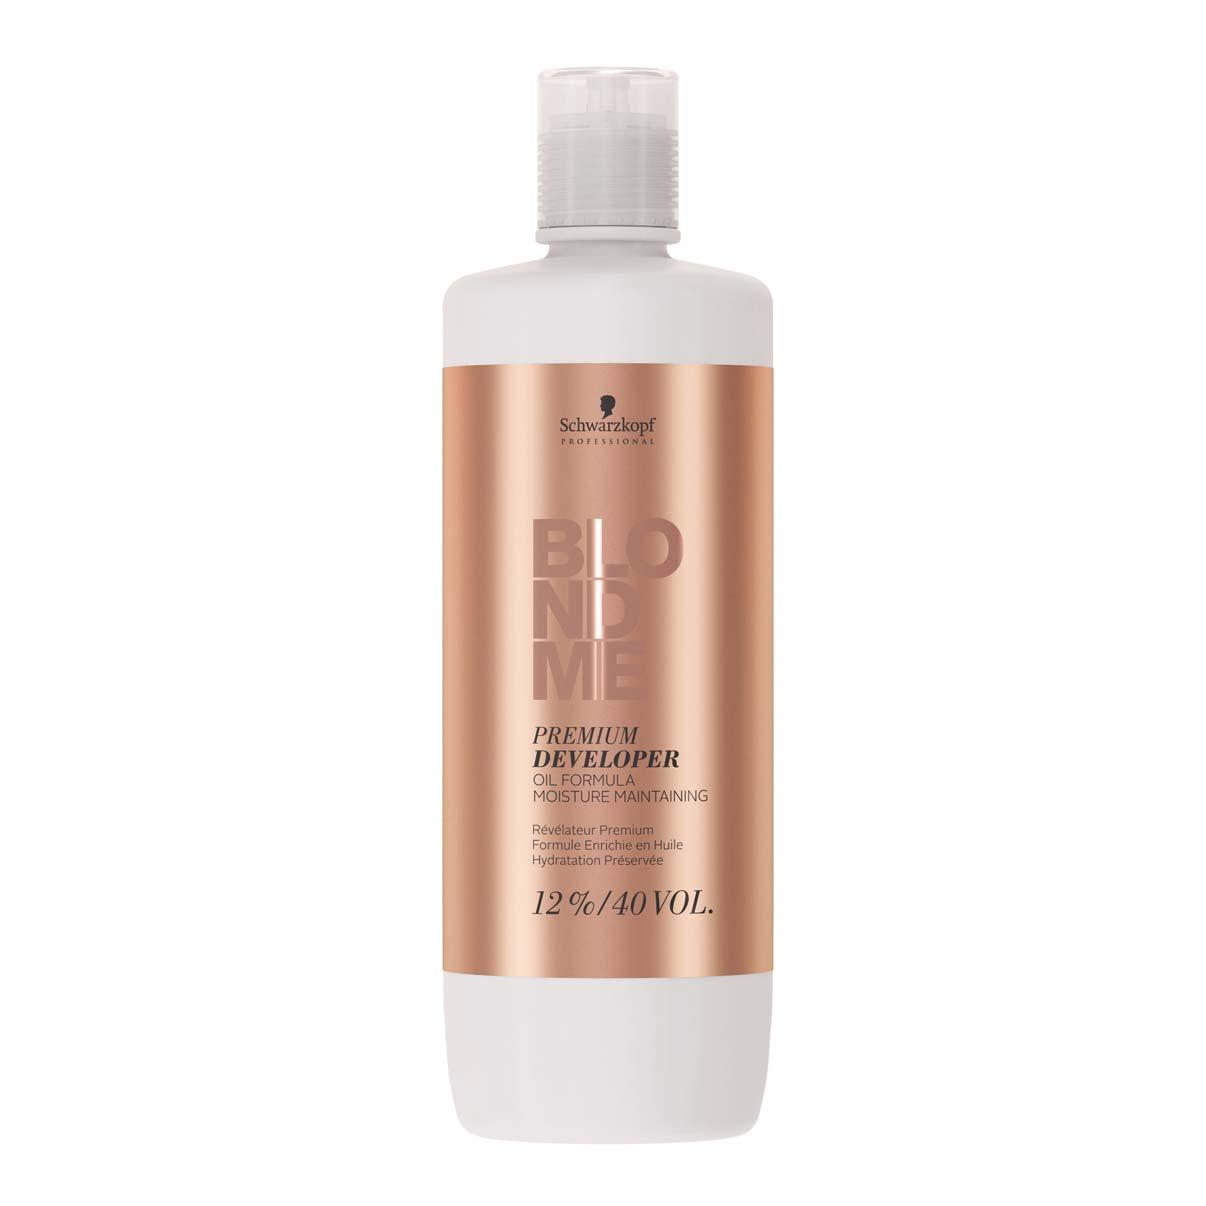 Schwarzkopf Professional BlondMe Loção Ativadora Premium 12% 40Vol 1000ml